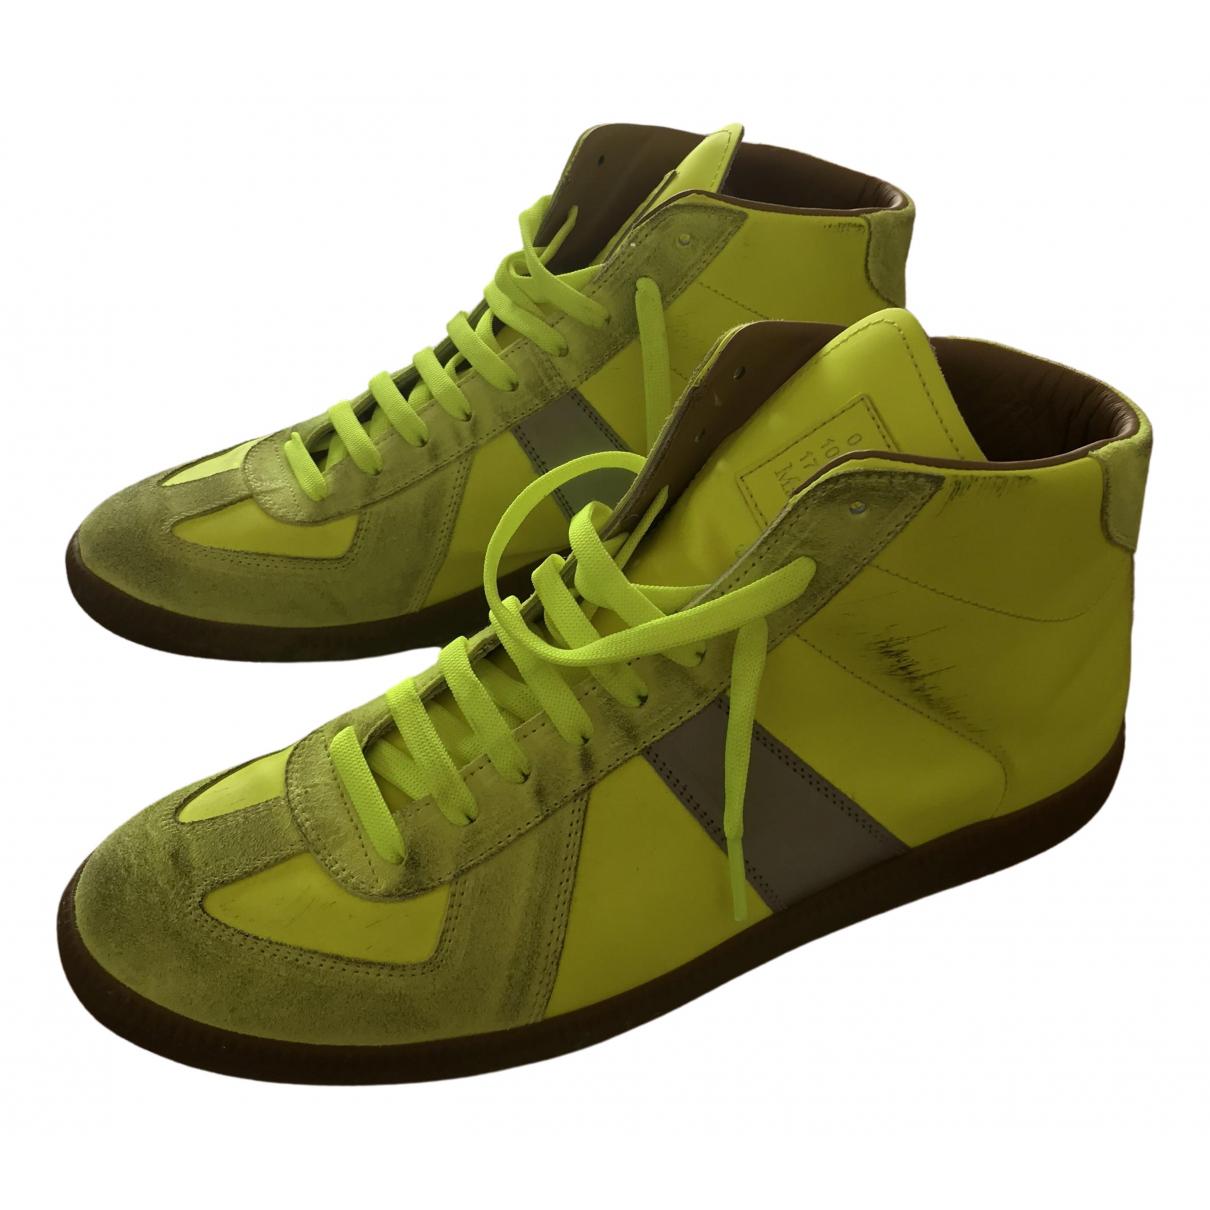 Maison Martin Margiela Replica Sneakers in  Gelb Lackleder